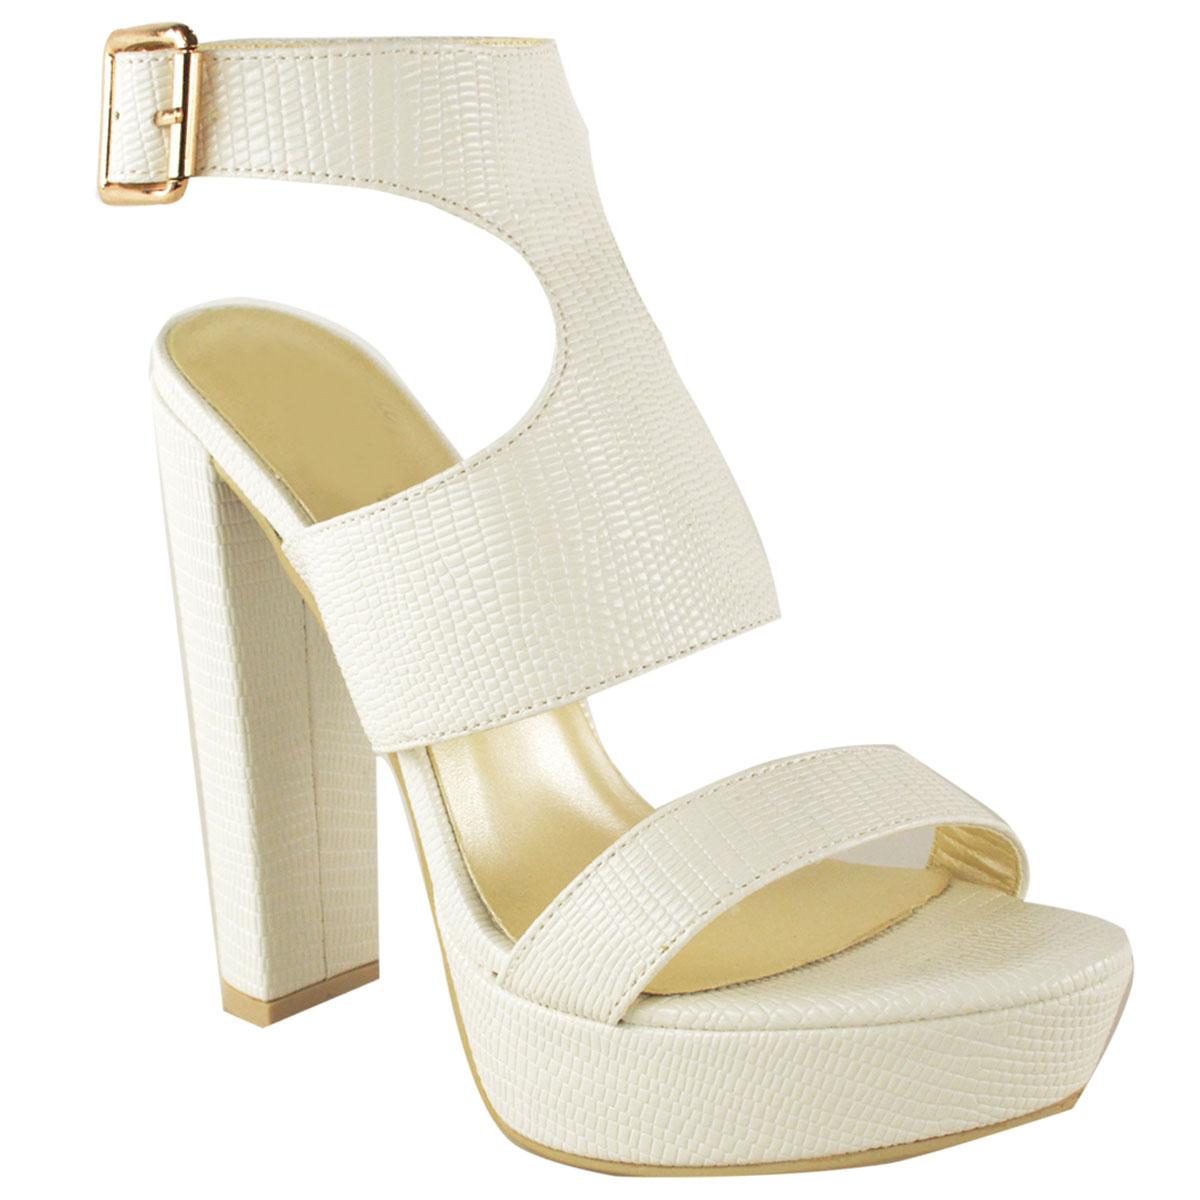 neu womens damen high heels plattform keilabsatz kn chel. Black Bedroom Furniture Sets. Home Design Ideas